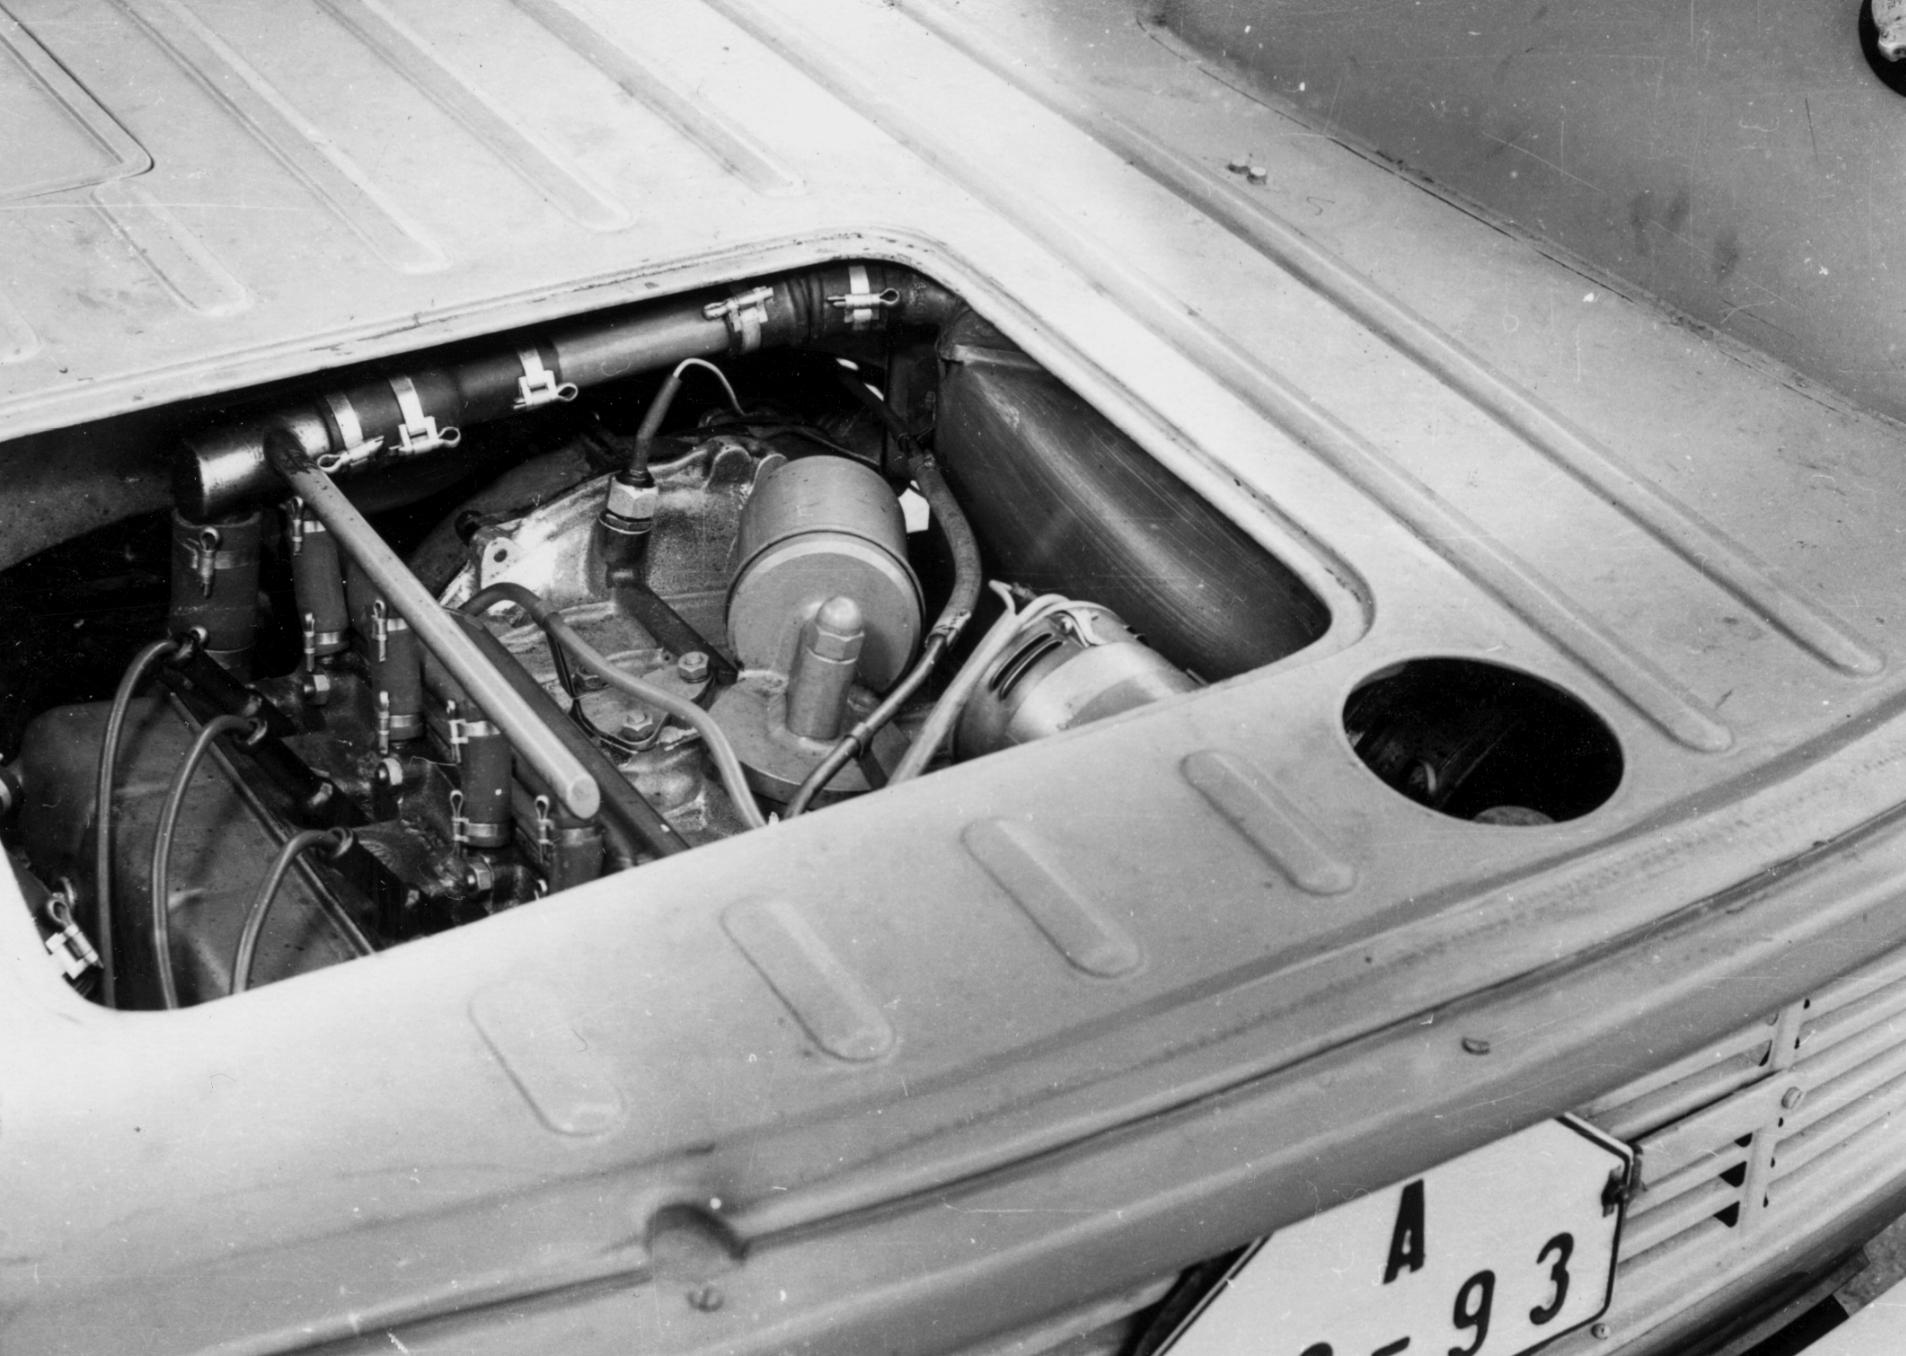 Lesser-known models from SKODA AUTO's 125-year history: SKODA Type 990 'Hajaja' - Image 3